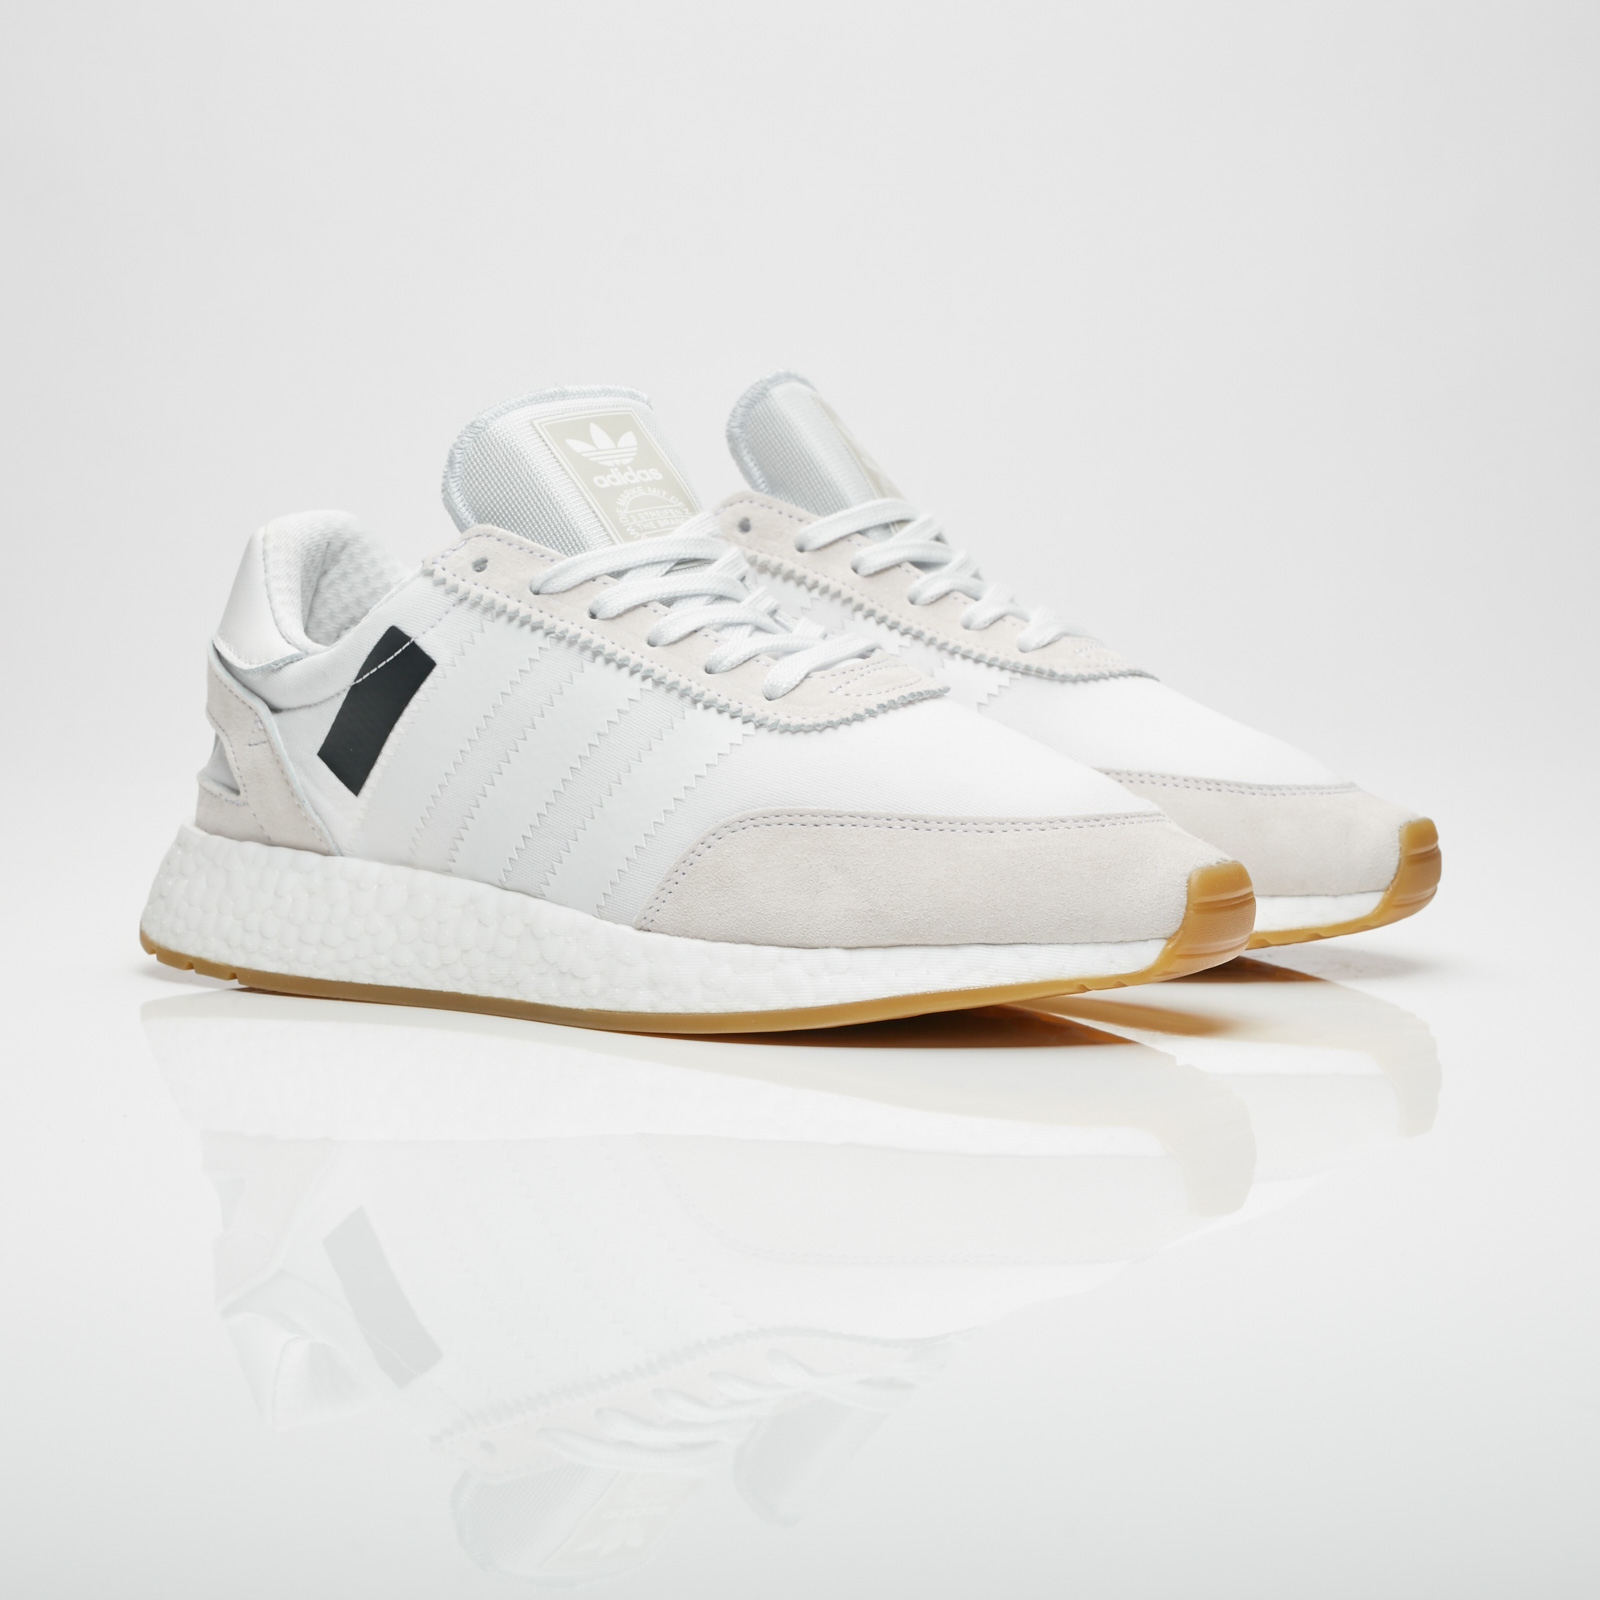 1a8c57b0109 adidas I-5923 - B42224 - Sneakersnstuff